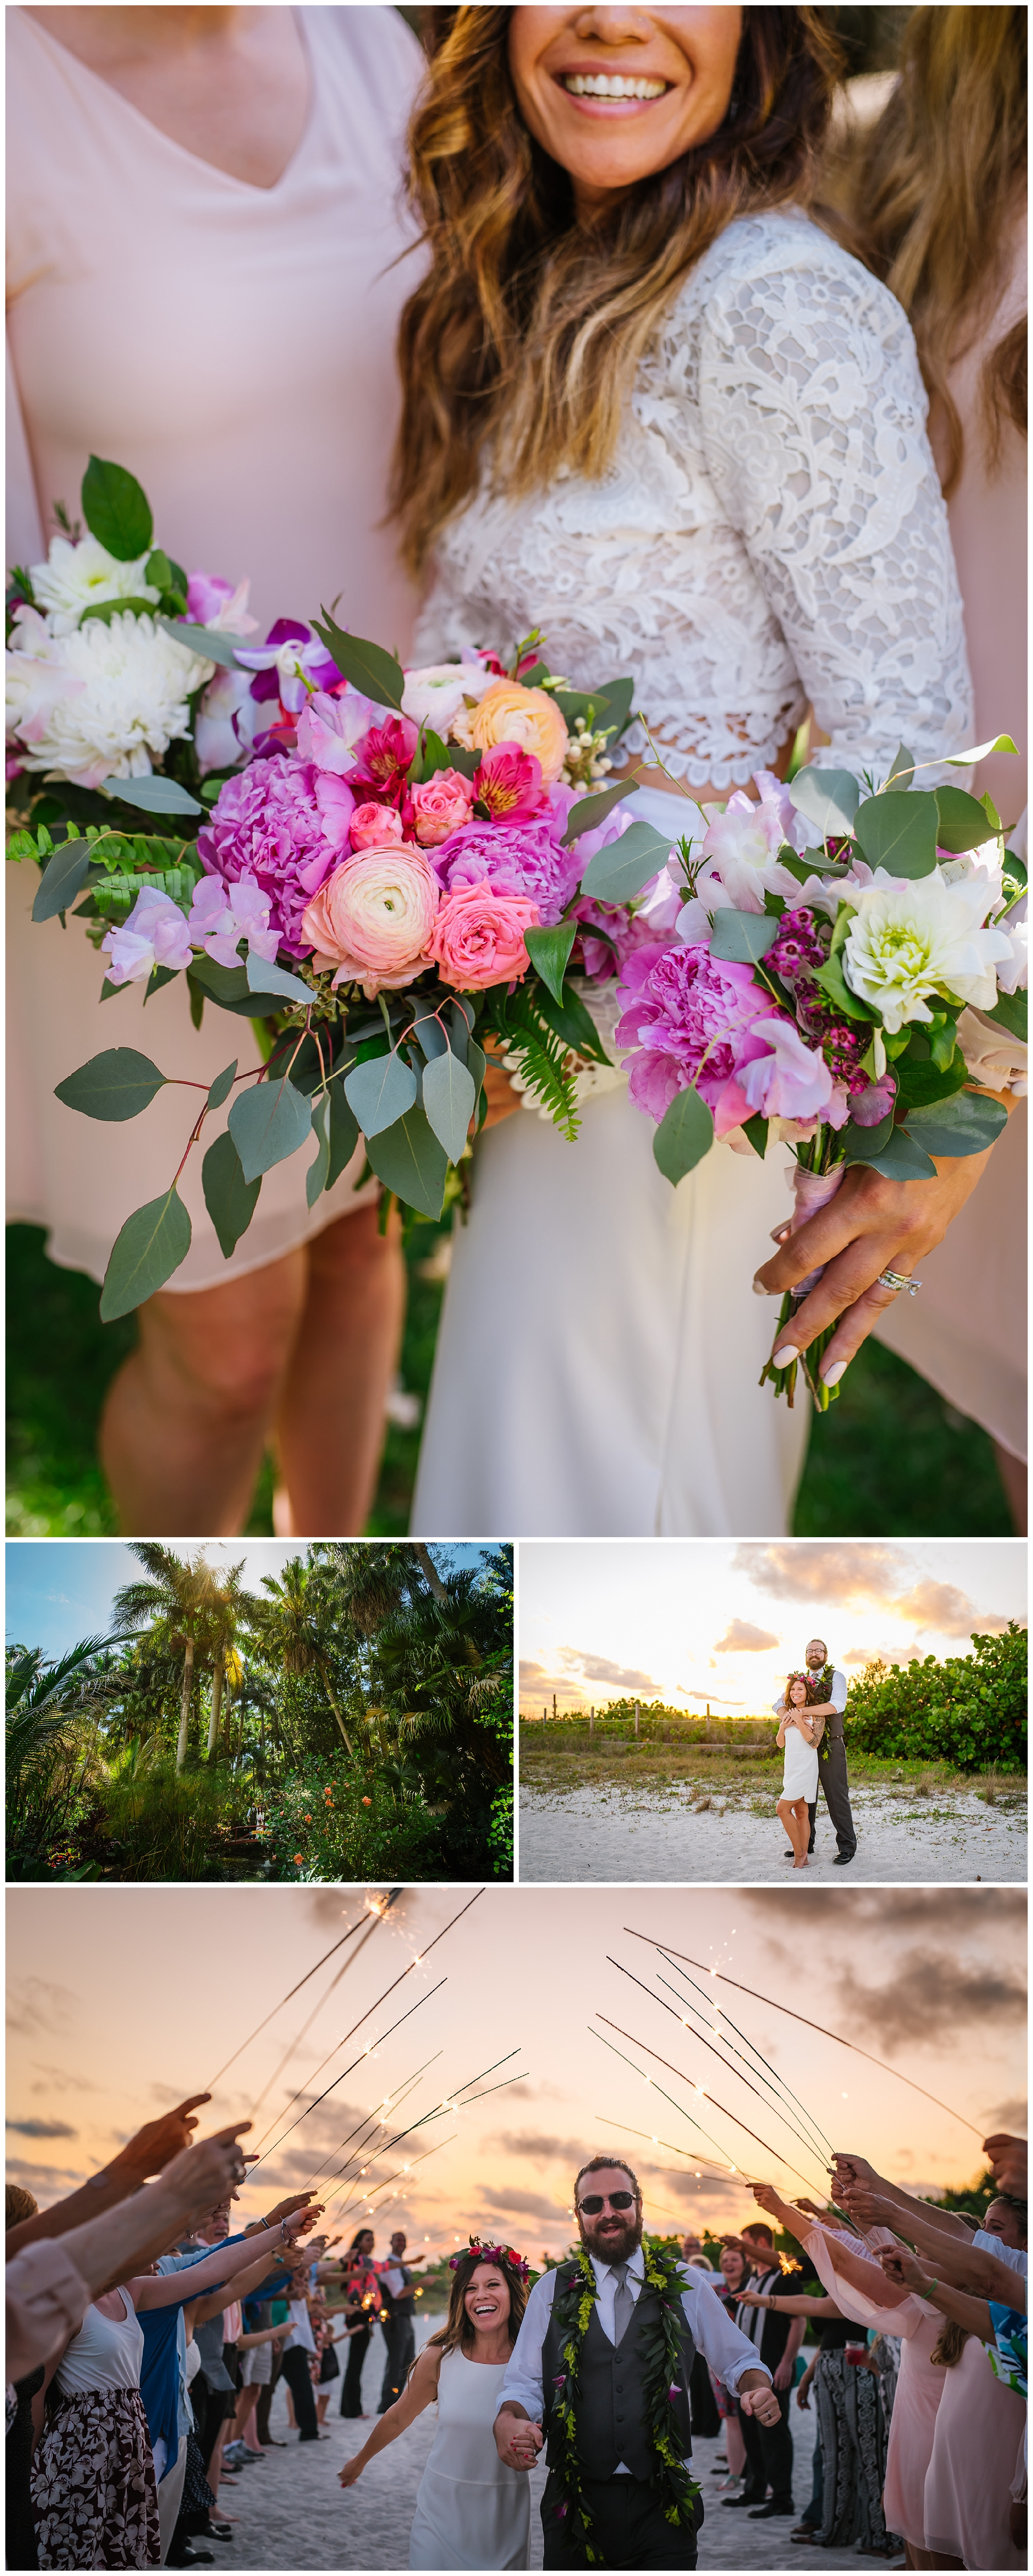 Ashlee-hamon-photography-year-in-review-2016-travel-wanderlust-vsco-adventure-wedding_0129.jpg